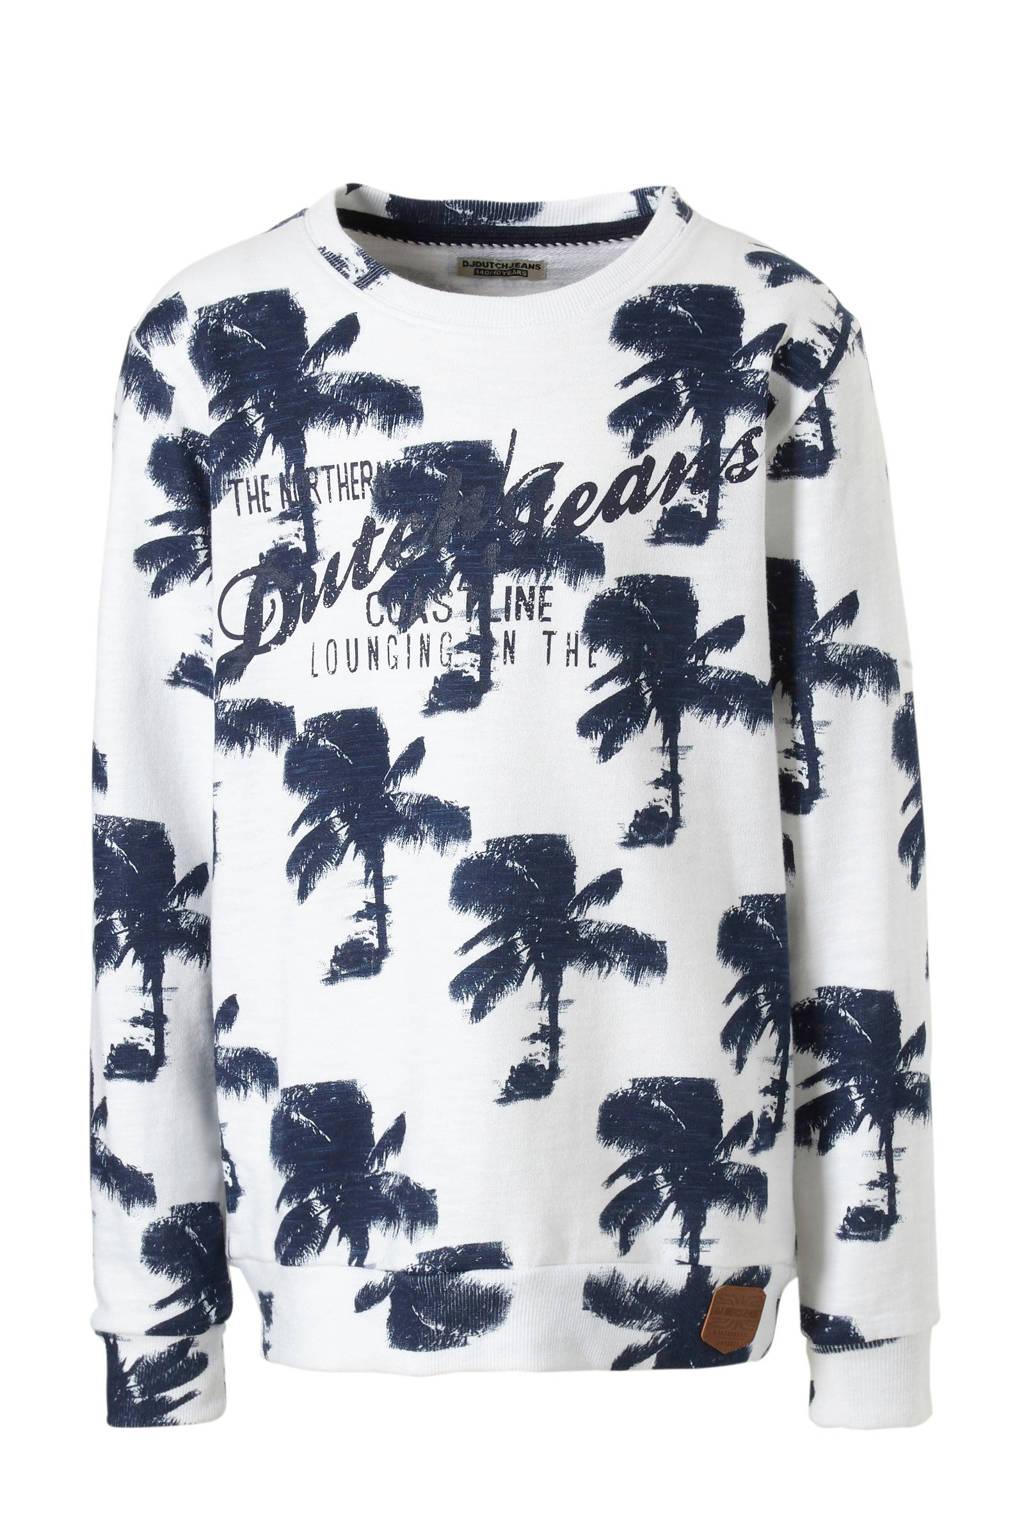 DJ Dutchjeans sweater met palmbomenprint, Wit/ marine